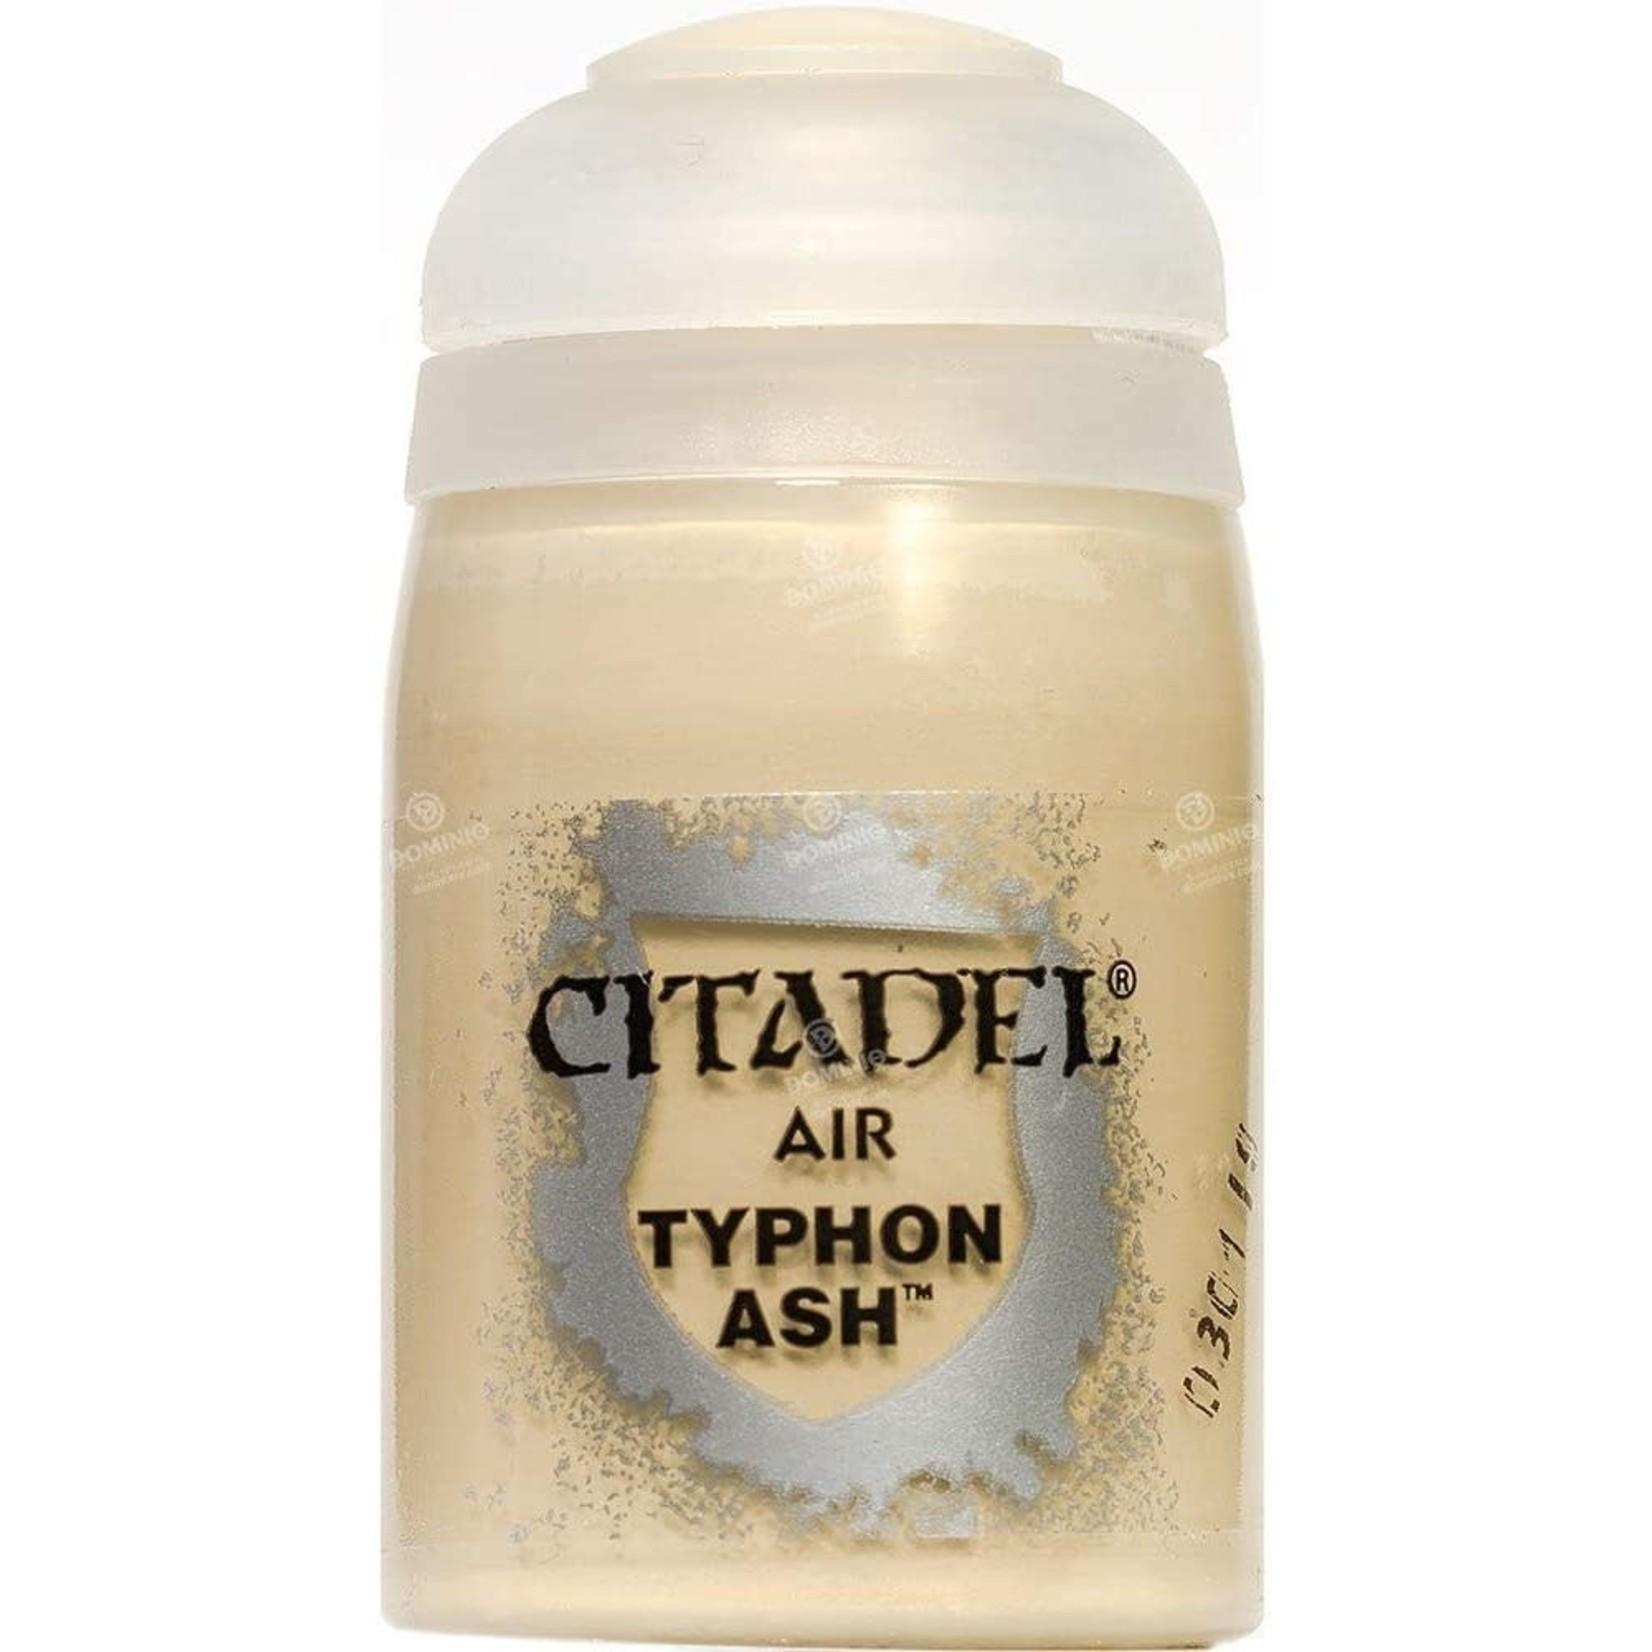 Games Workshop Citadel Paint: Typhon Ash Air (24 ml)